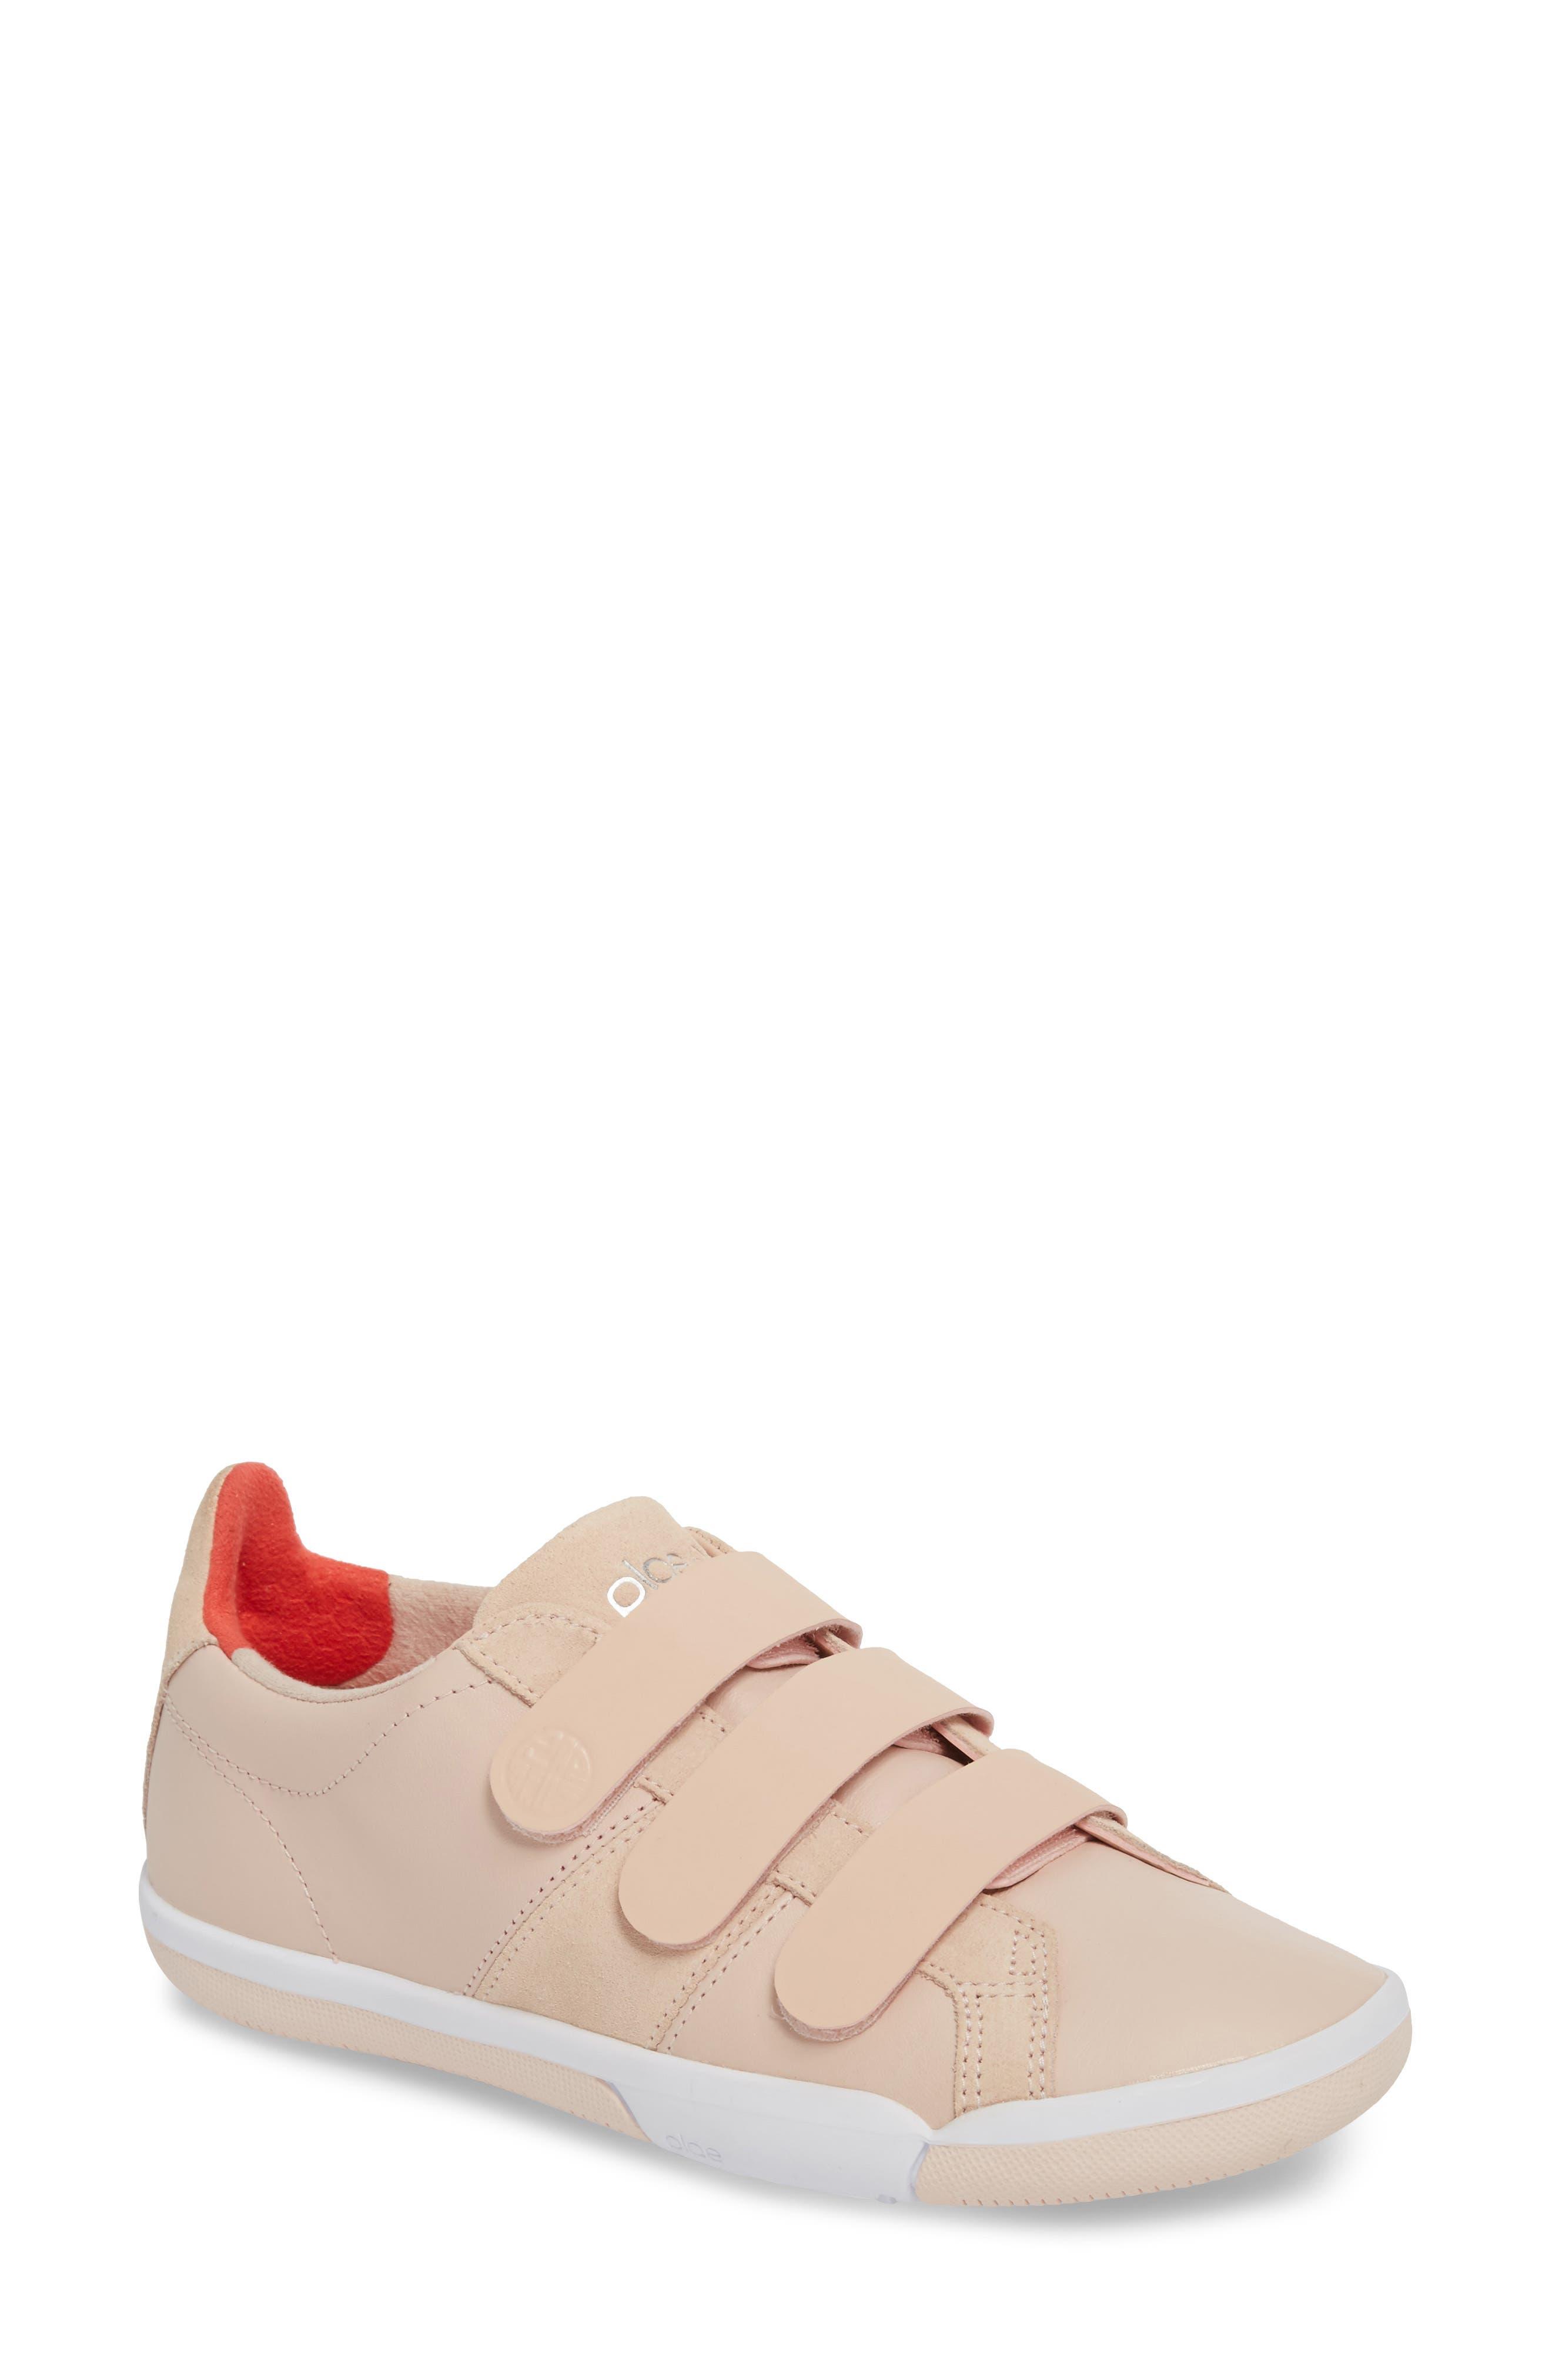 Larkin Sneaker,                             Main thumbnail 1, color,                             Cameo Rose Leather